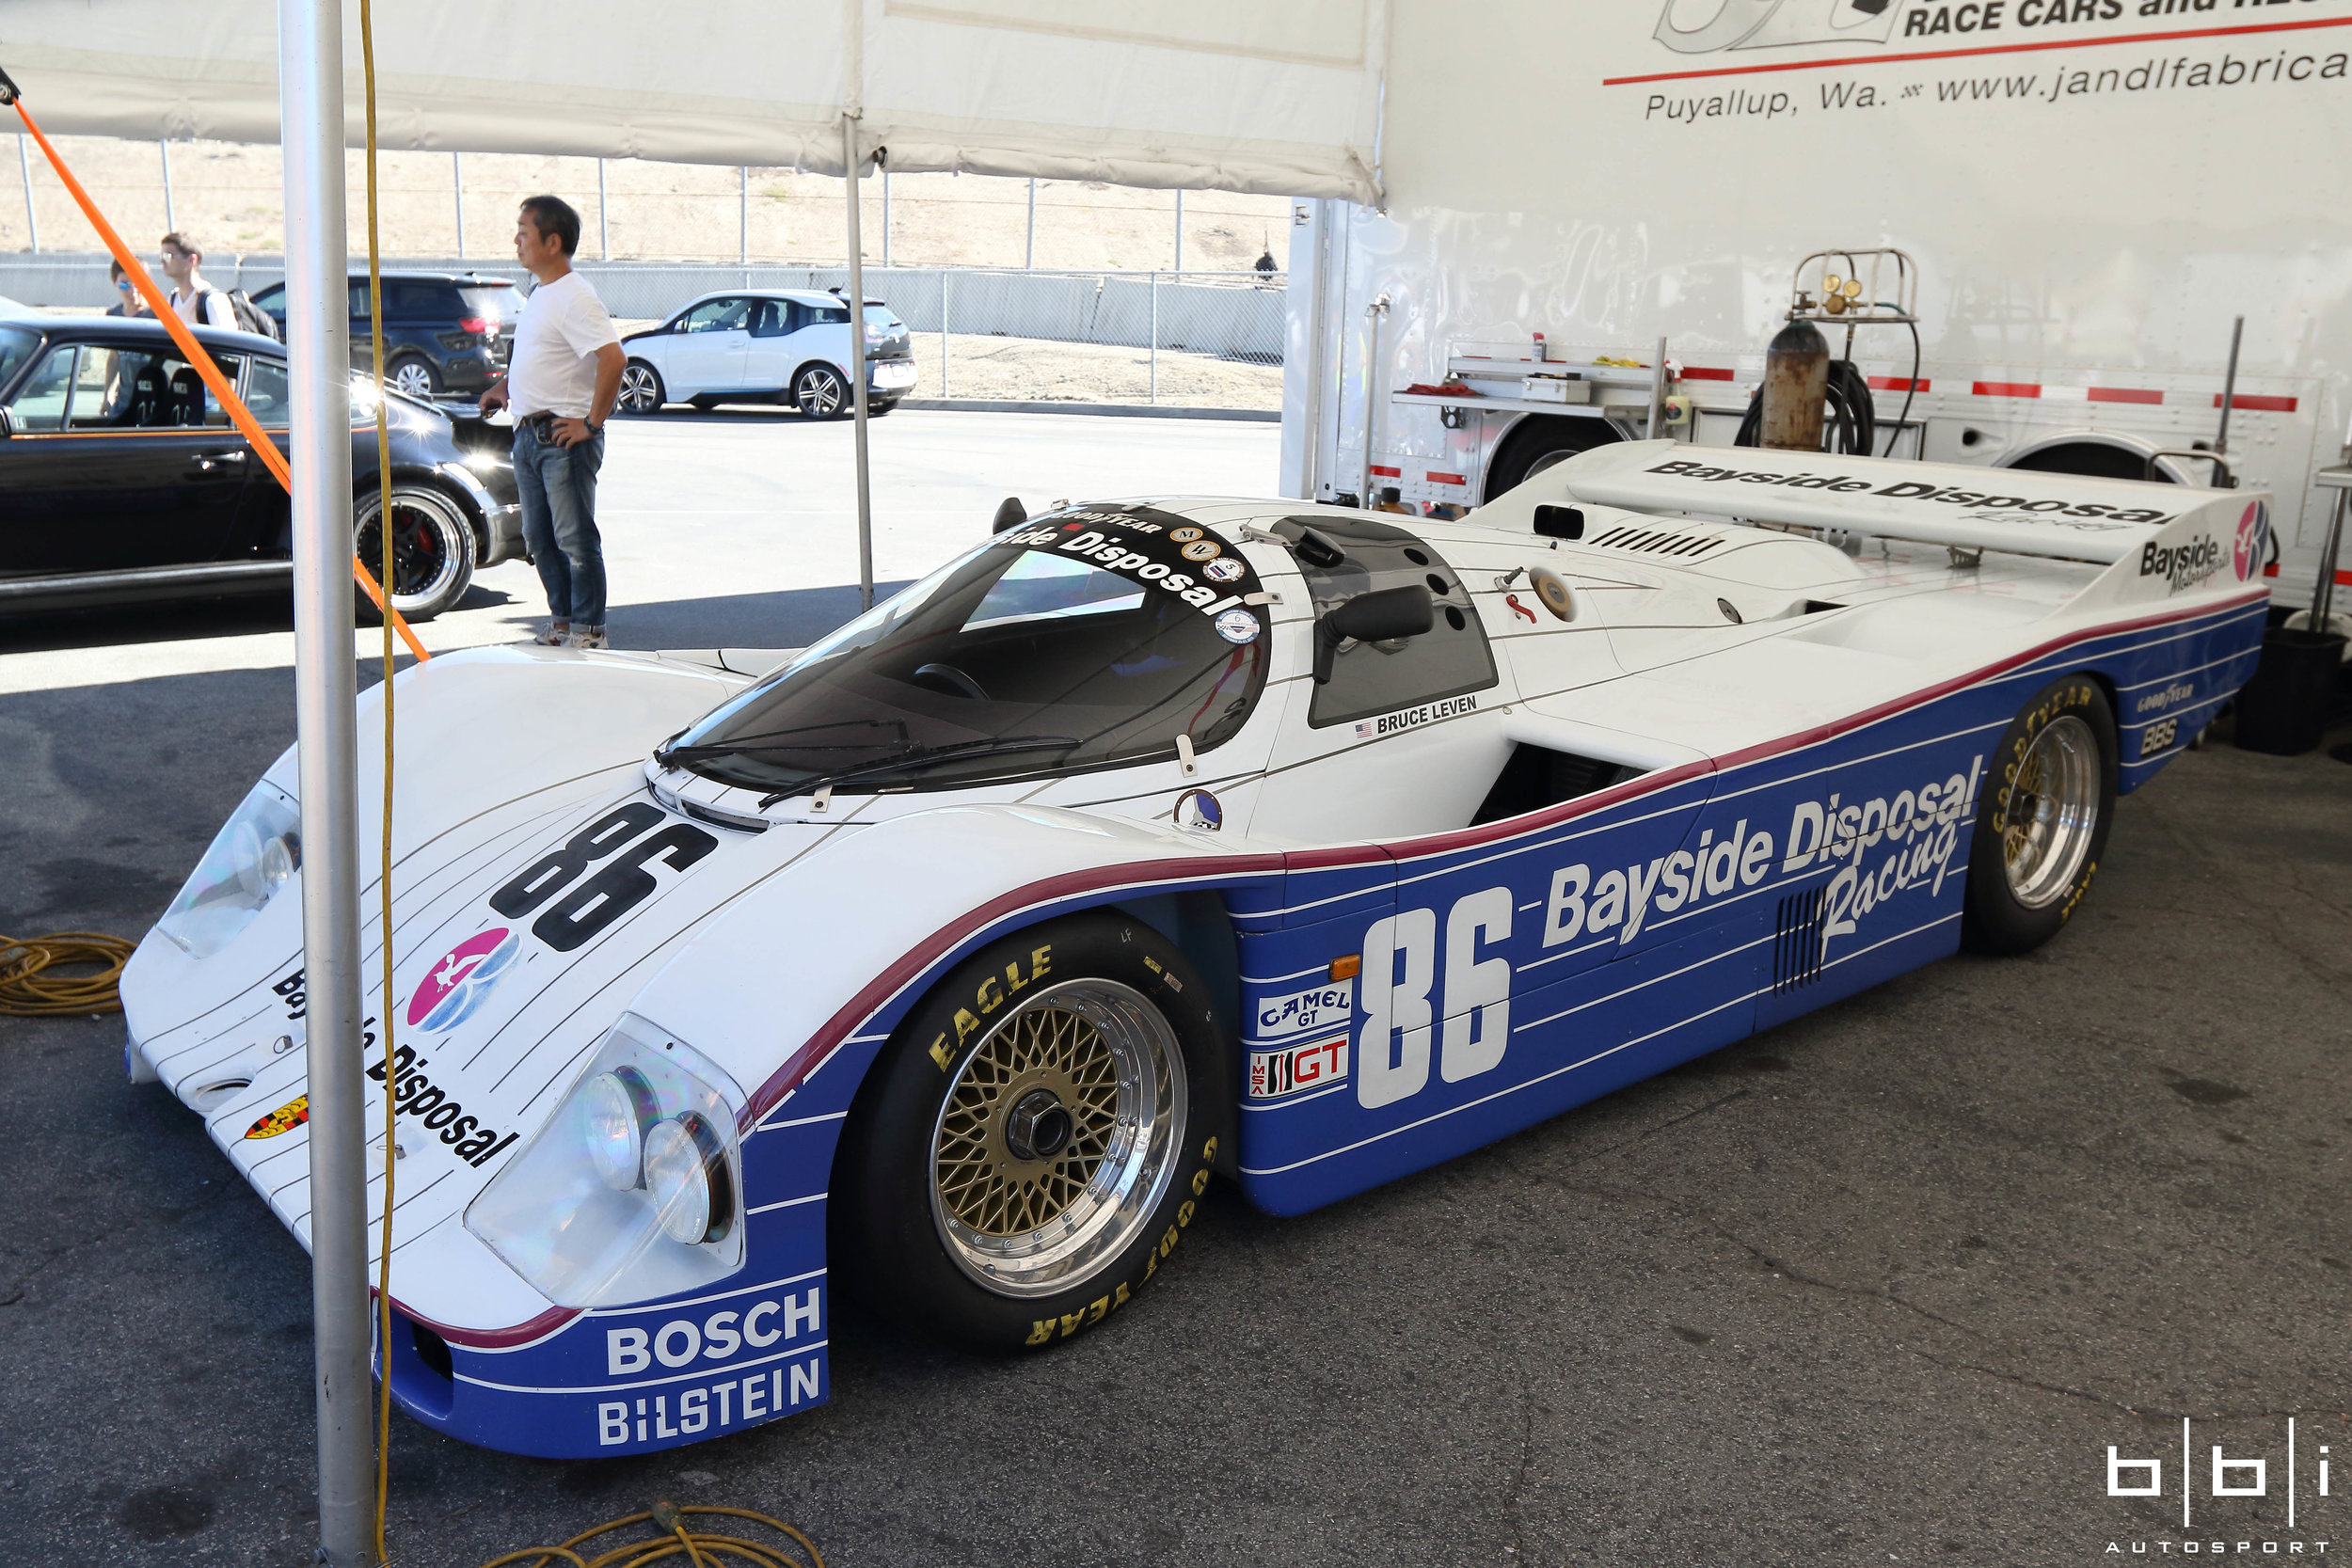 #86 Bayside Disposal Racing Porsche Type 962